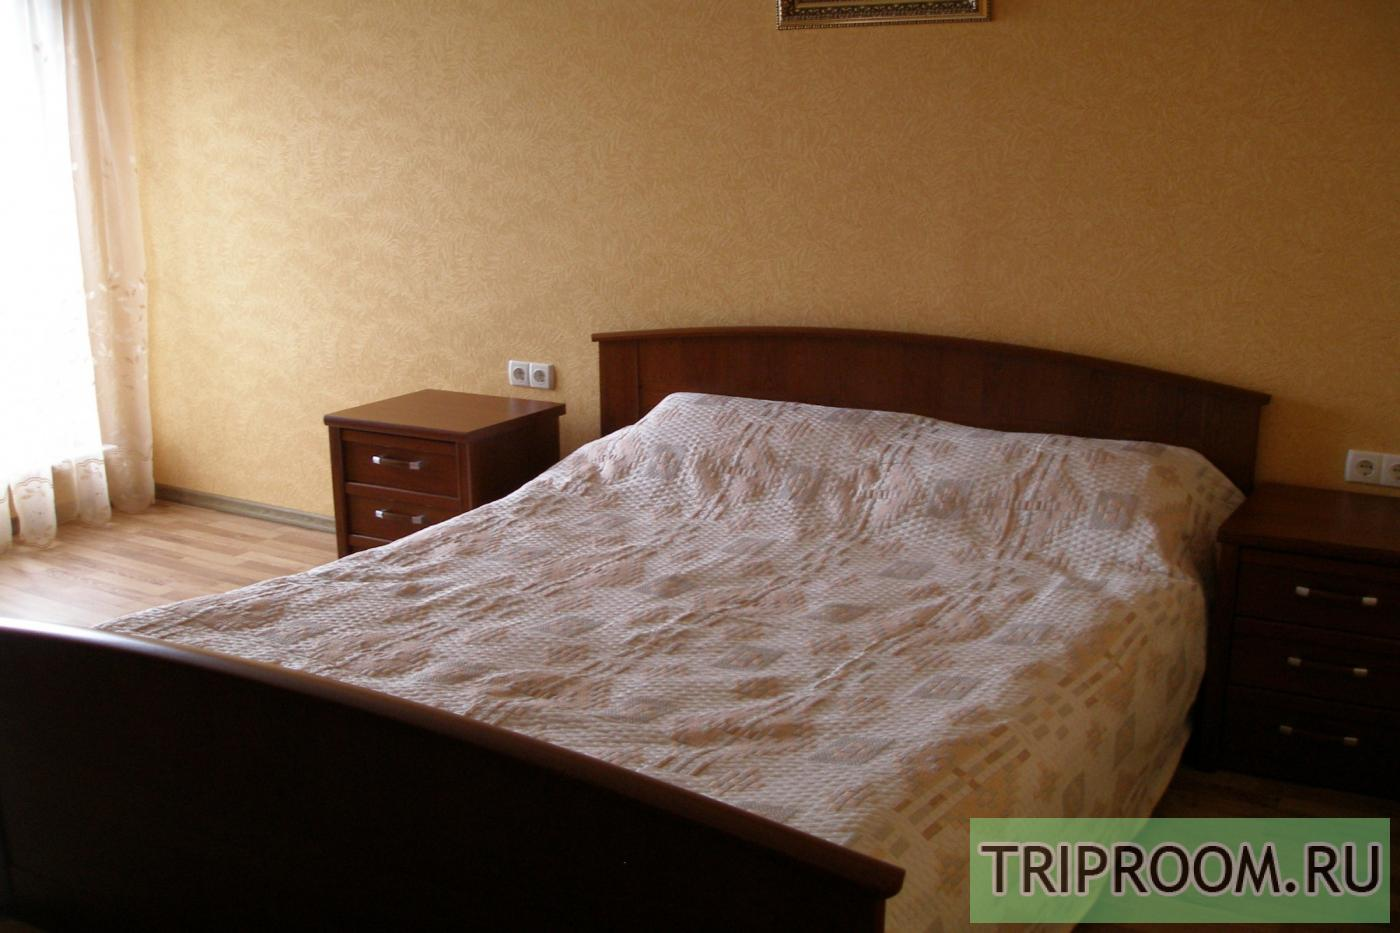 3-комнатная квартира посуточно (вариант № 34537), ул. Чехова улица, фото № 5